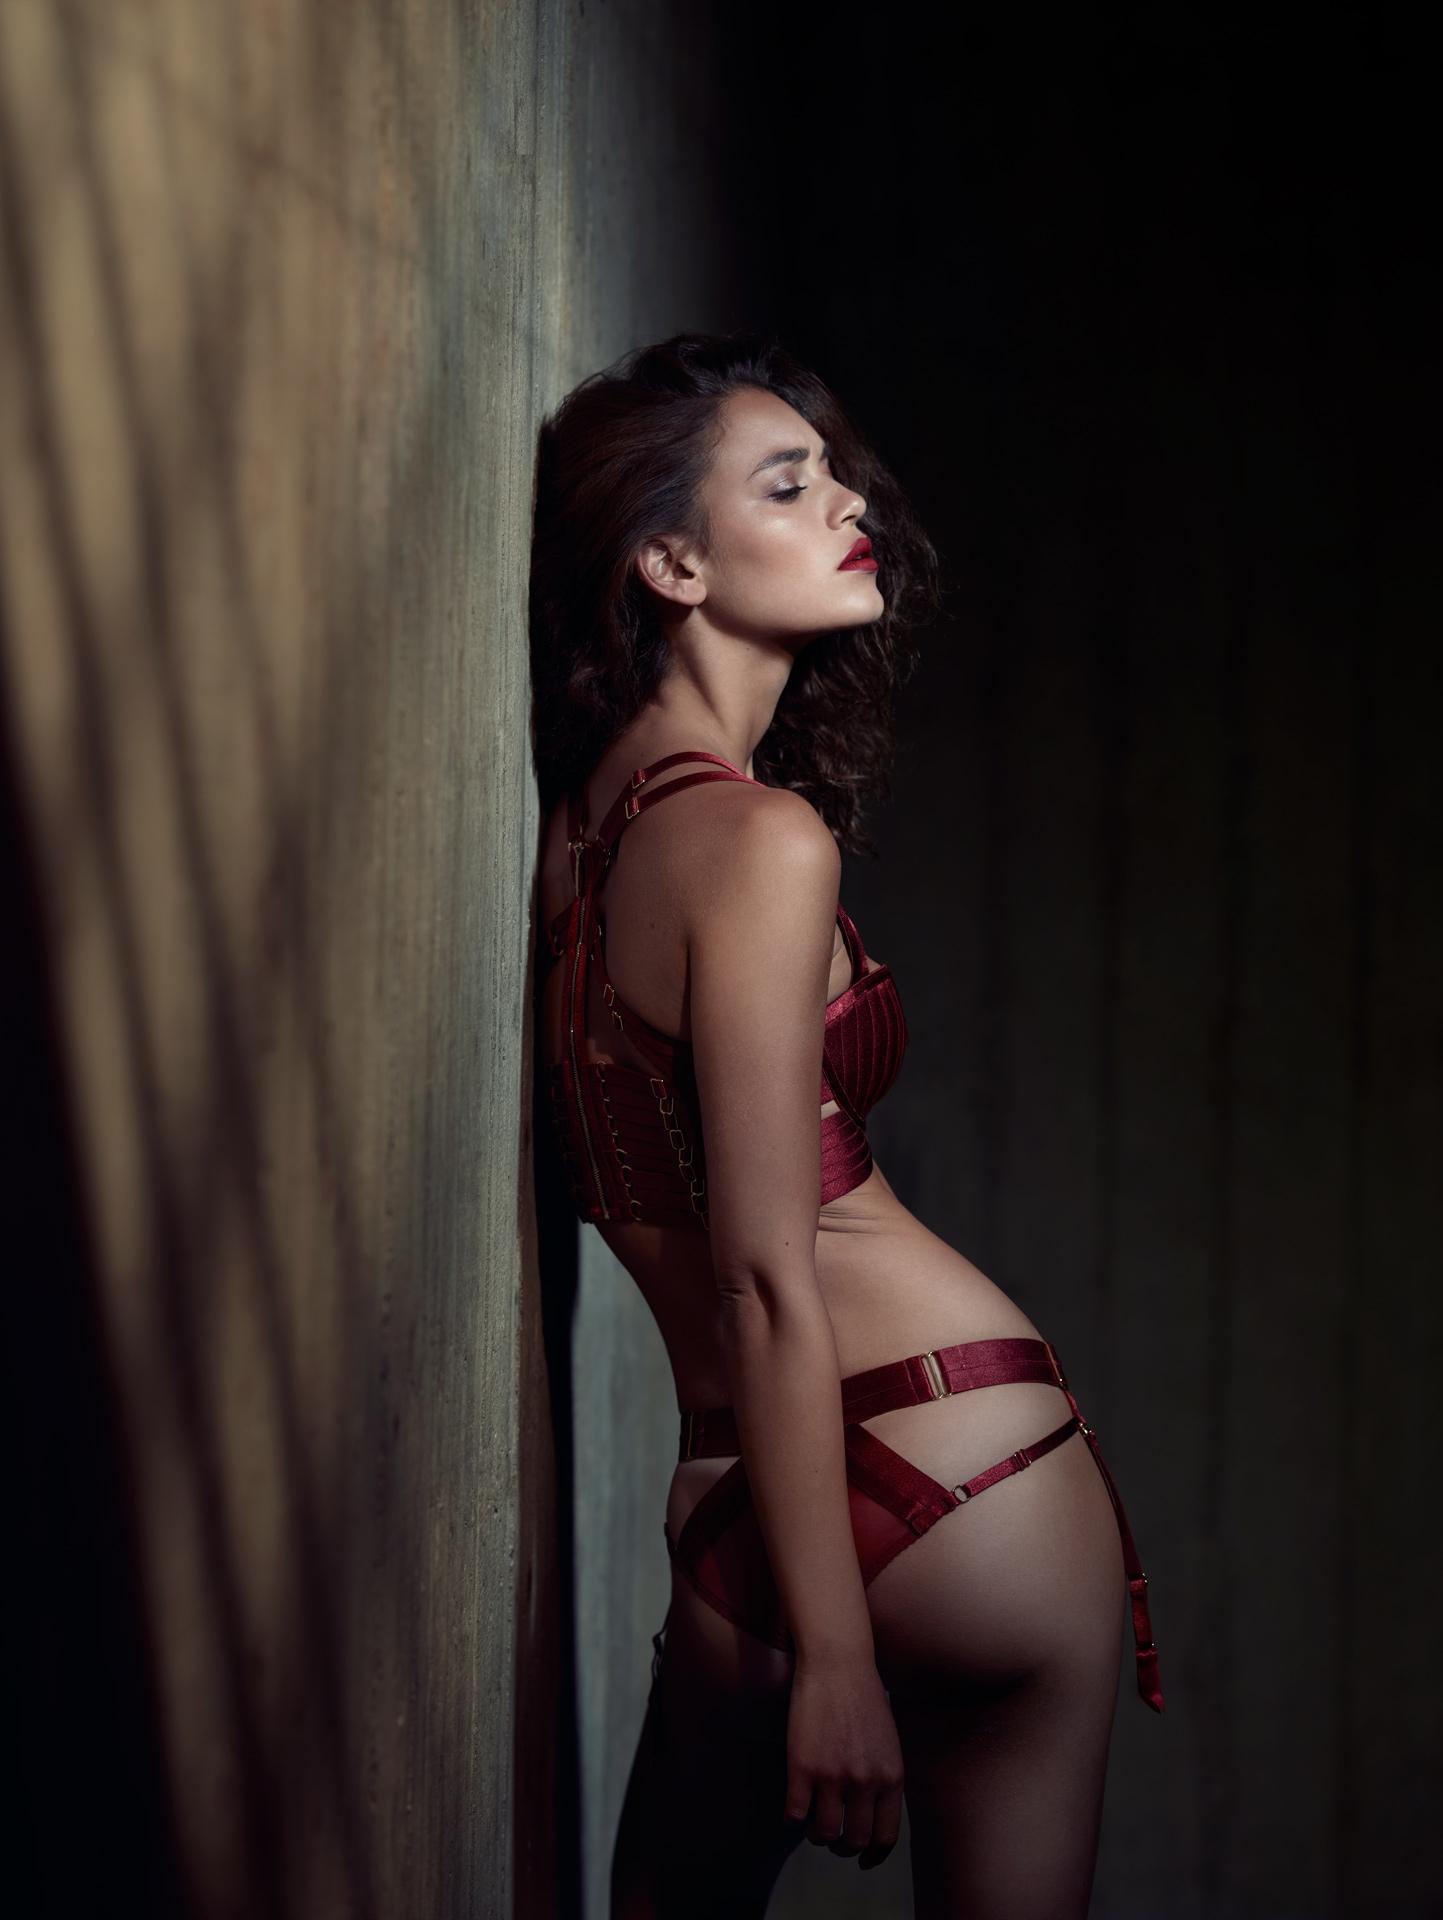 cinema movie light burn red penitentiary jail concrete bordelle lingerie frederic mercier photographer one color